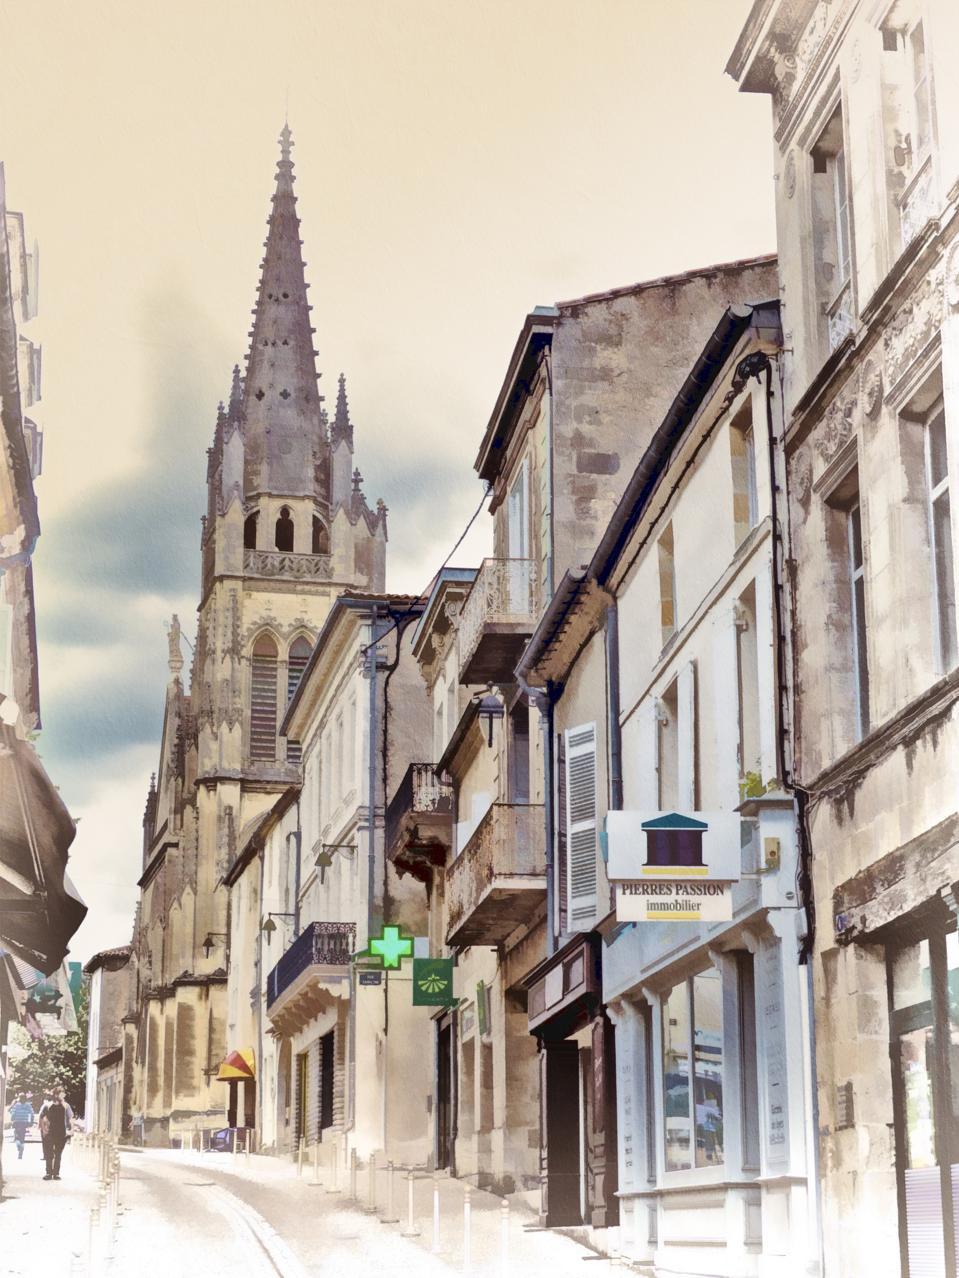 Cadillac village and church steeple, Bordeaux, France